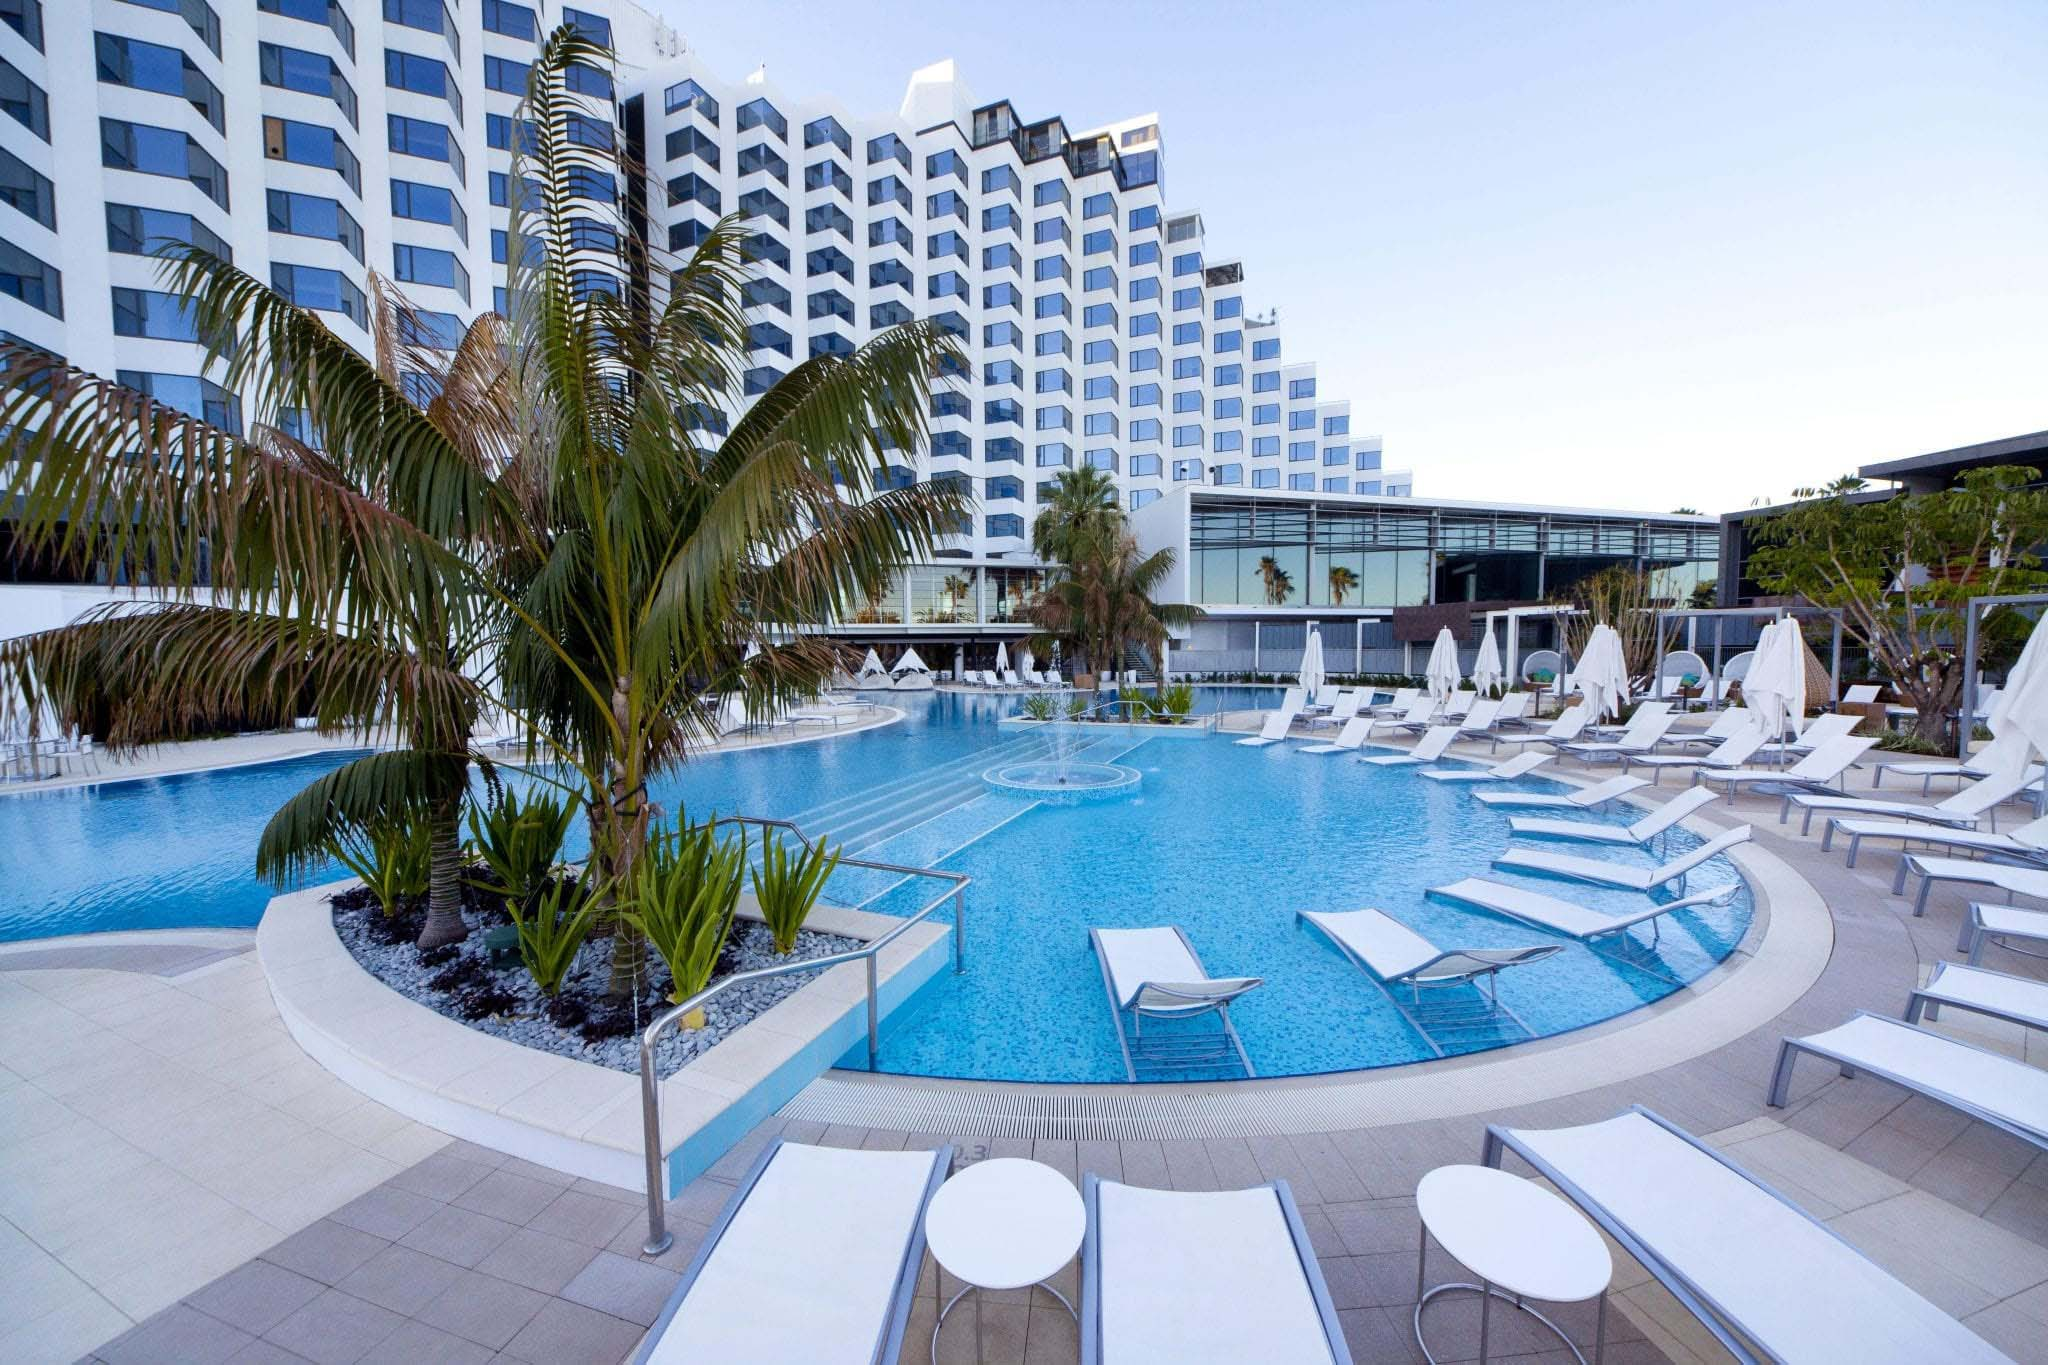 Crown Resort Perth, Western Australia